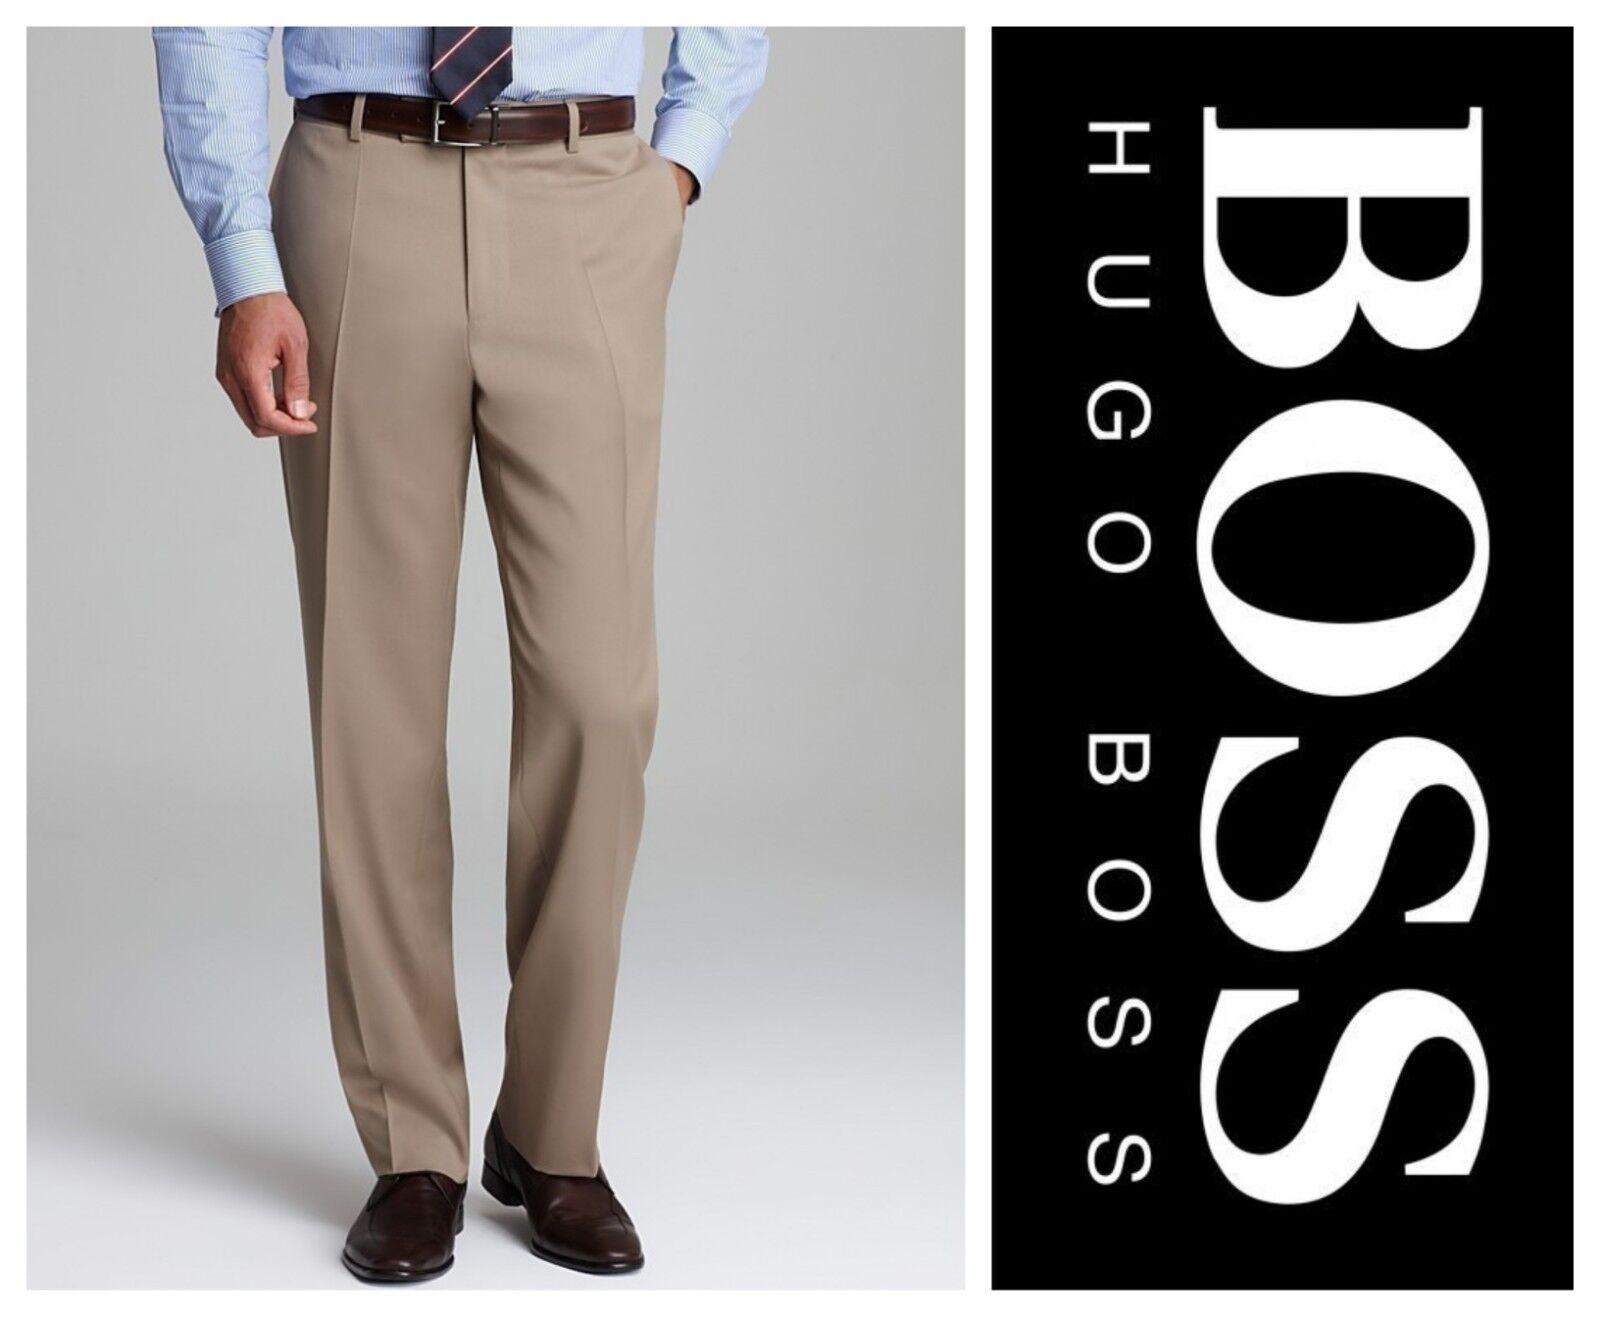 HUGO BOSS JEFFREY SOLID WOOL REGULAR FIT BROWN DRESS PANTS Sz 38  NEW     249